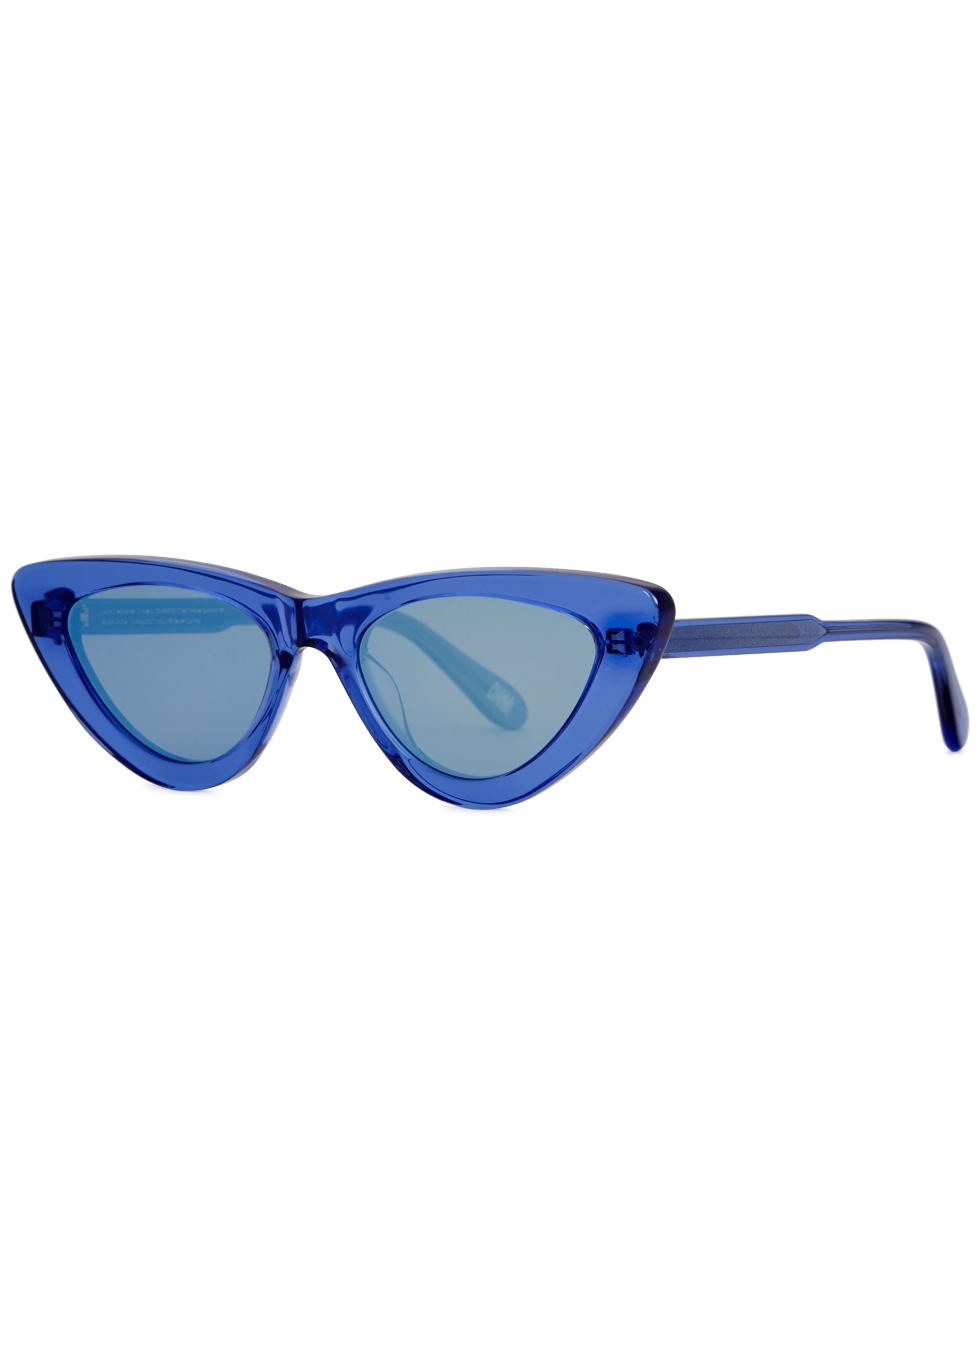 CHIMI 006 BLUE CAT-EYE SUNGLASSES